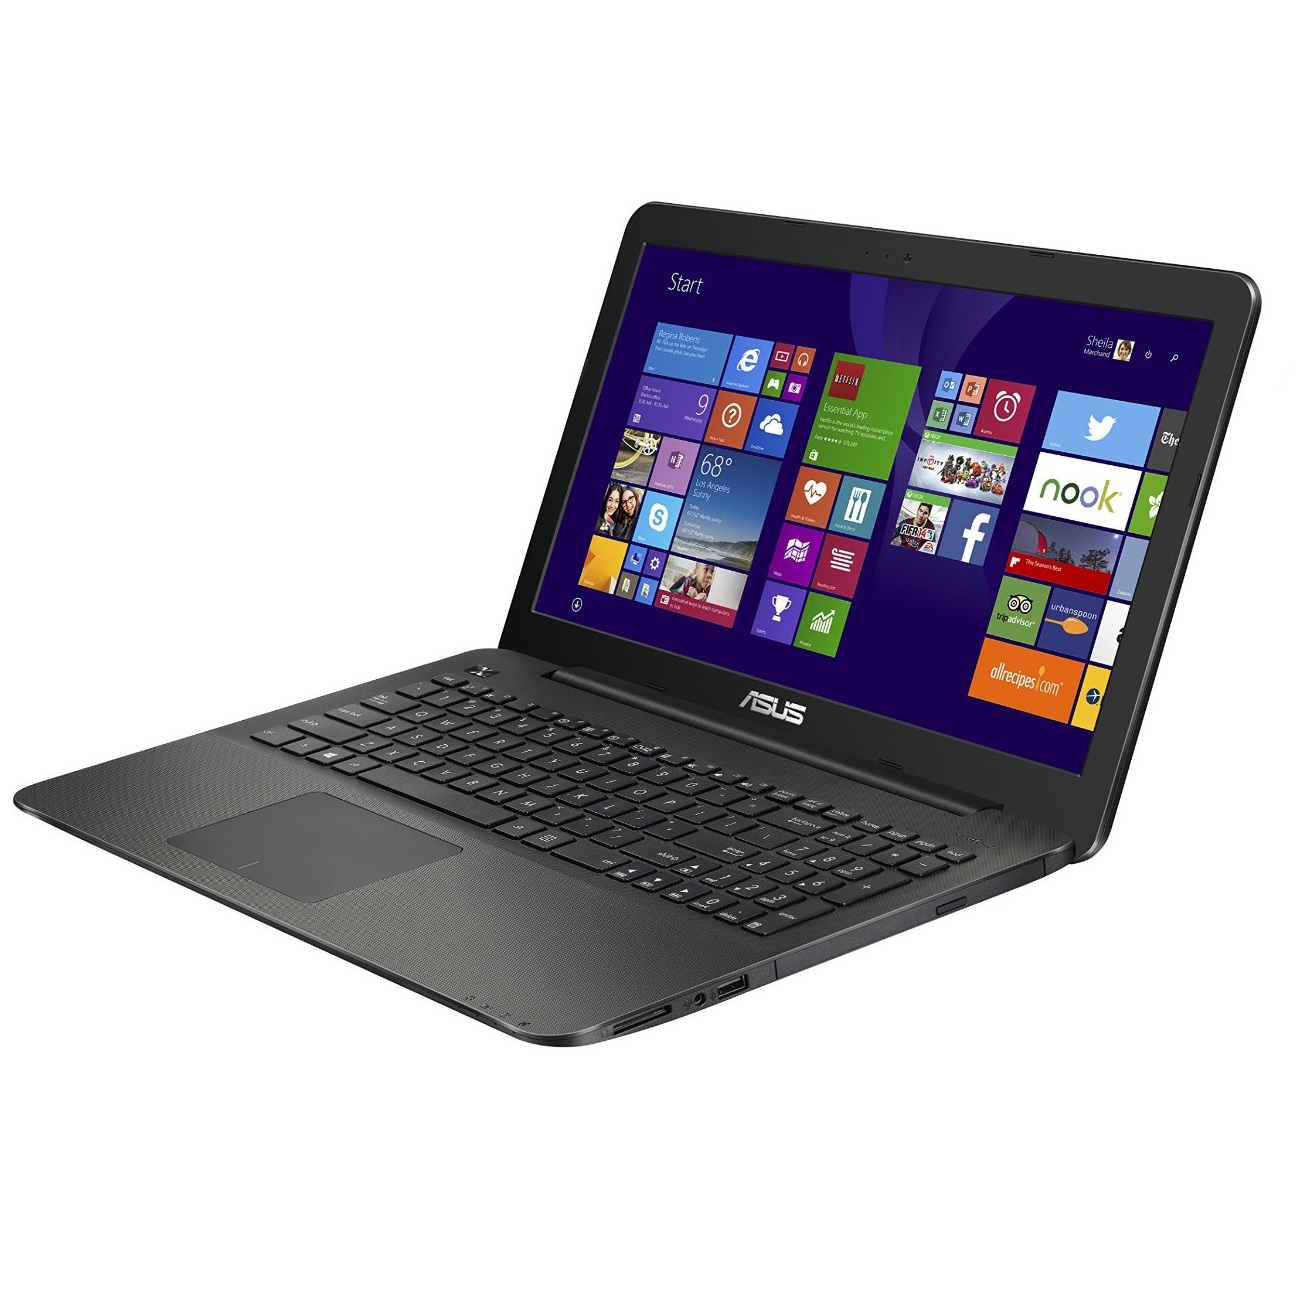 Laptop Asus X554LP-XX064D Core i5 5200U 4GB/500GB/VGA AMD R5 M230-1GB/15.6